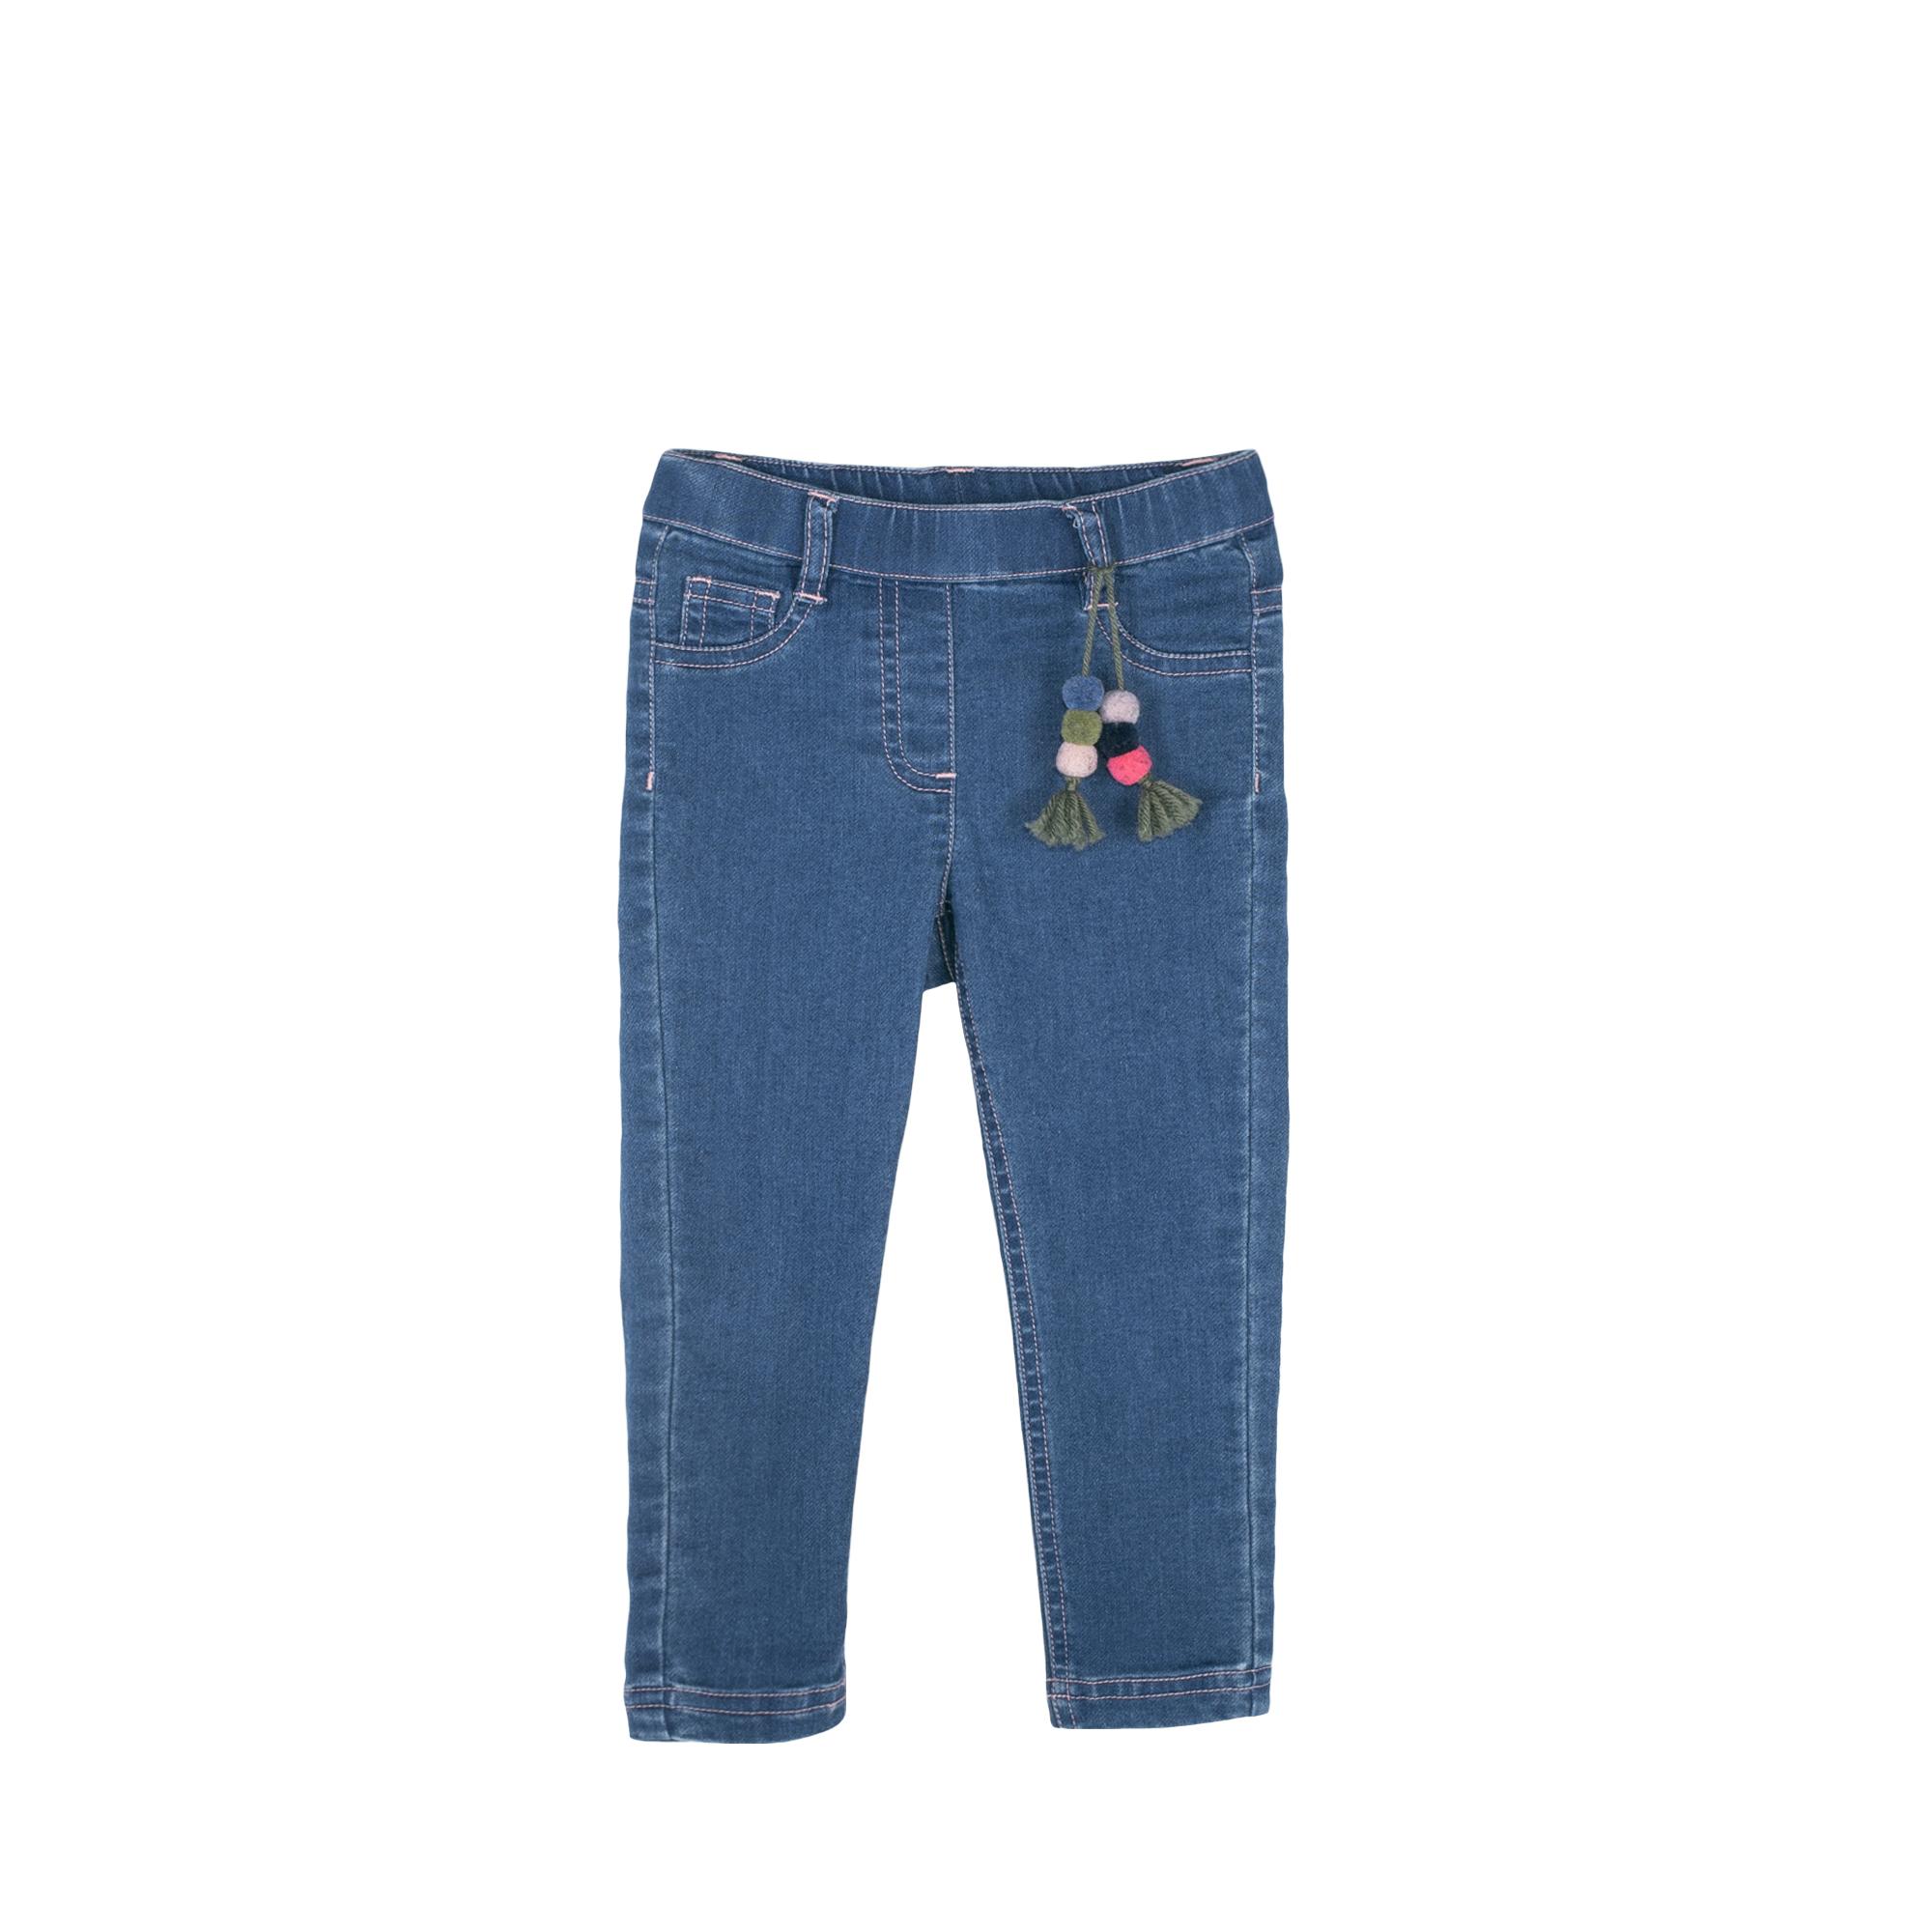 Брюки Coccodrillo брюки джинсы и штанишки coccodrillo брюки для девочки family forest